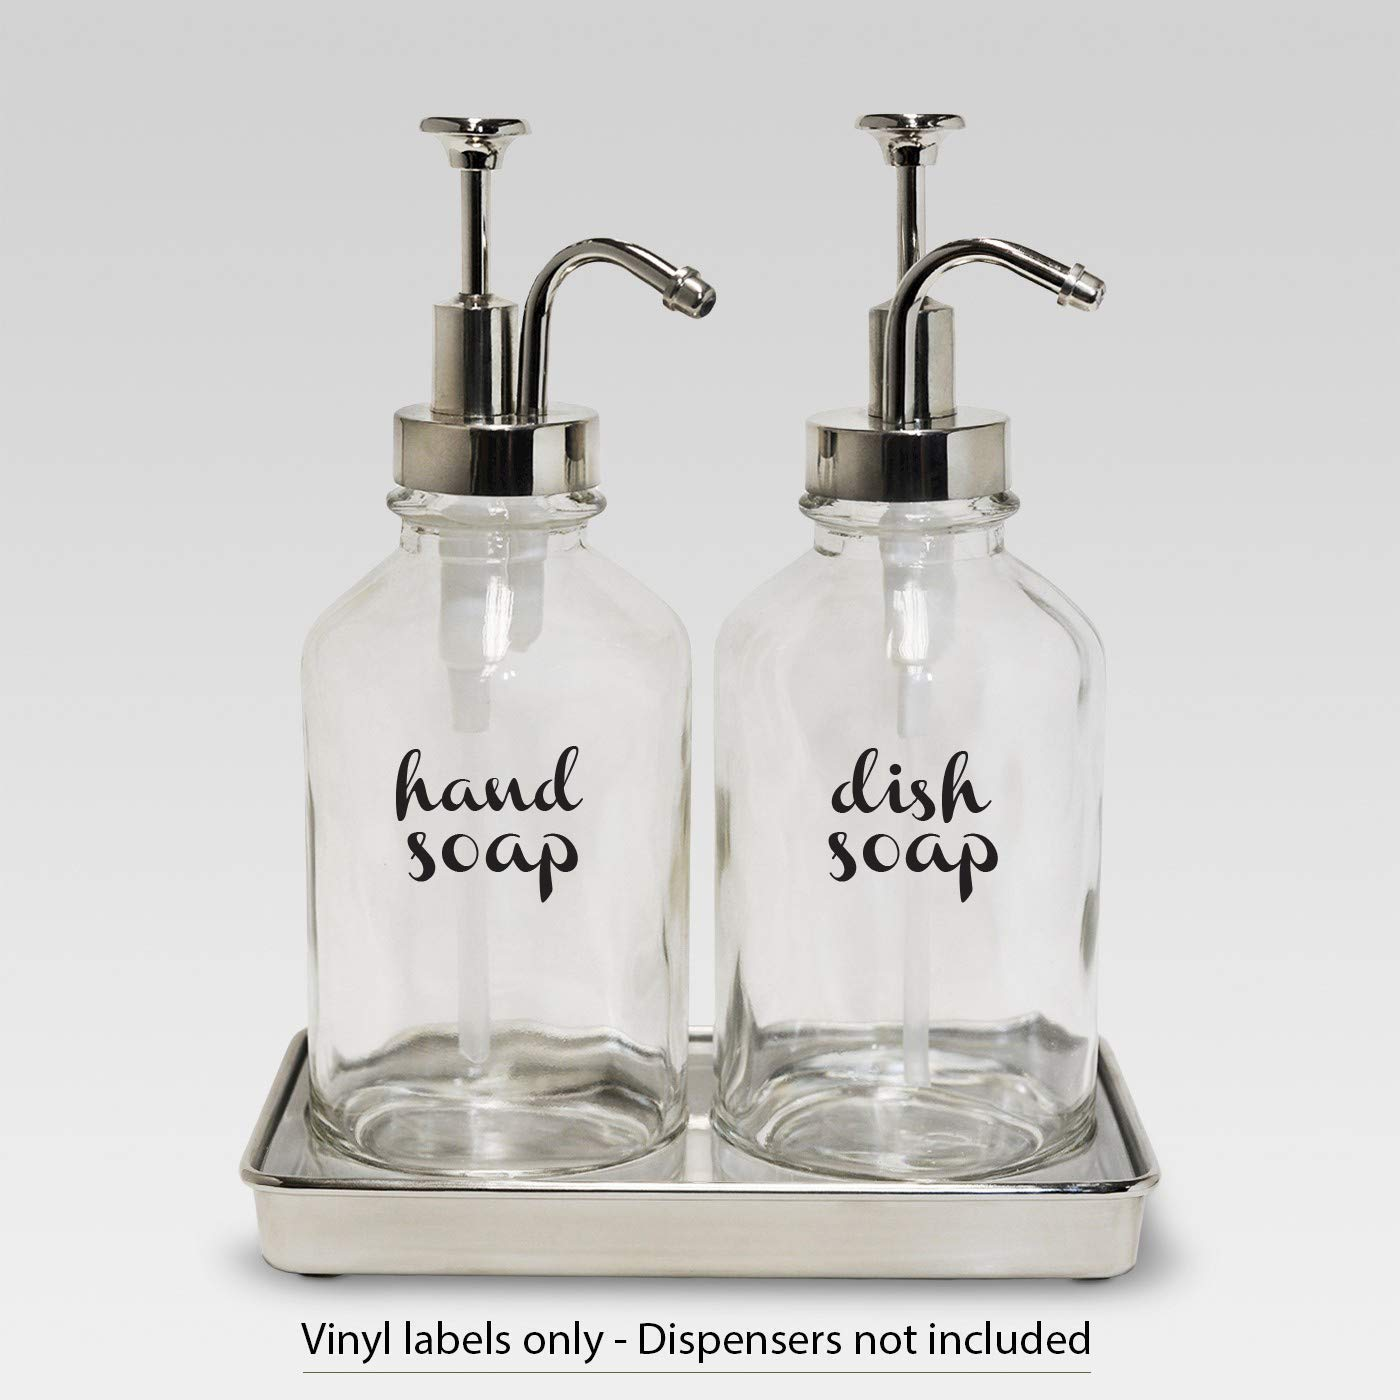 Hand Soap Dish Soap - vinyl decal sticker farmhouse kitchen